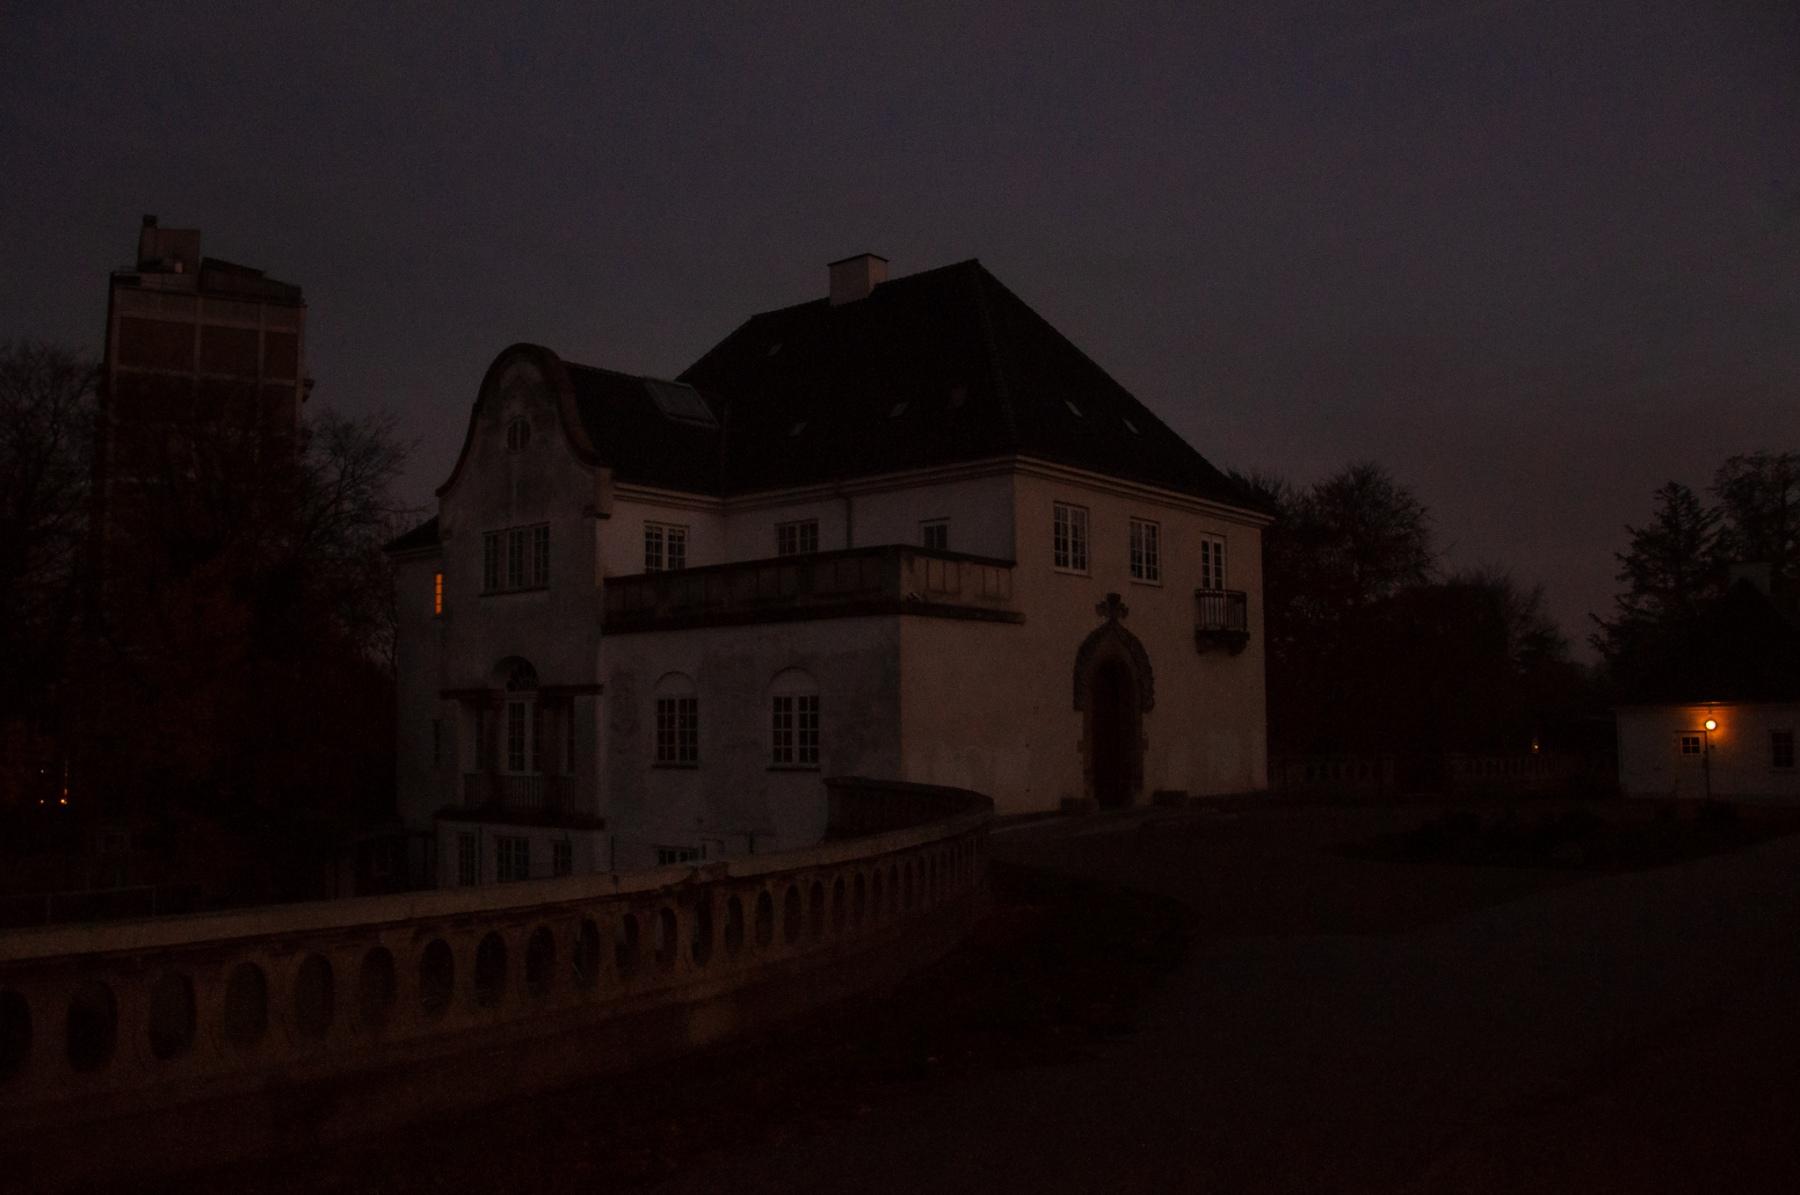 anja-blaksmark-solbakken-institution